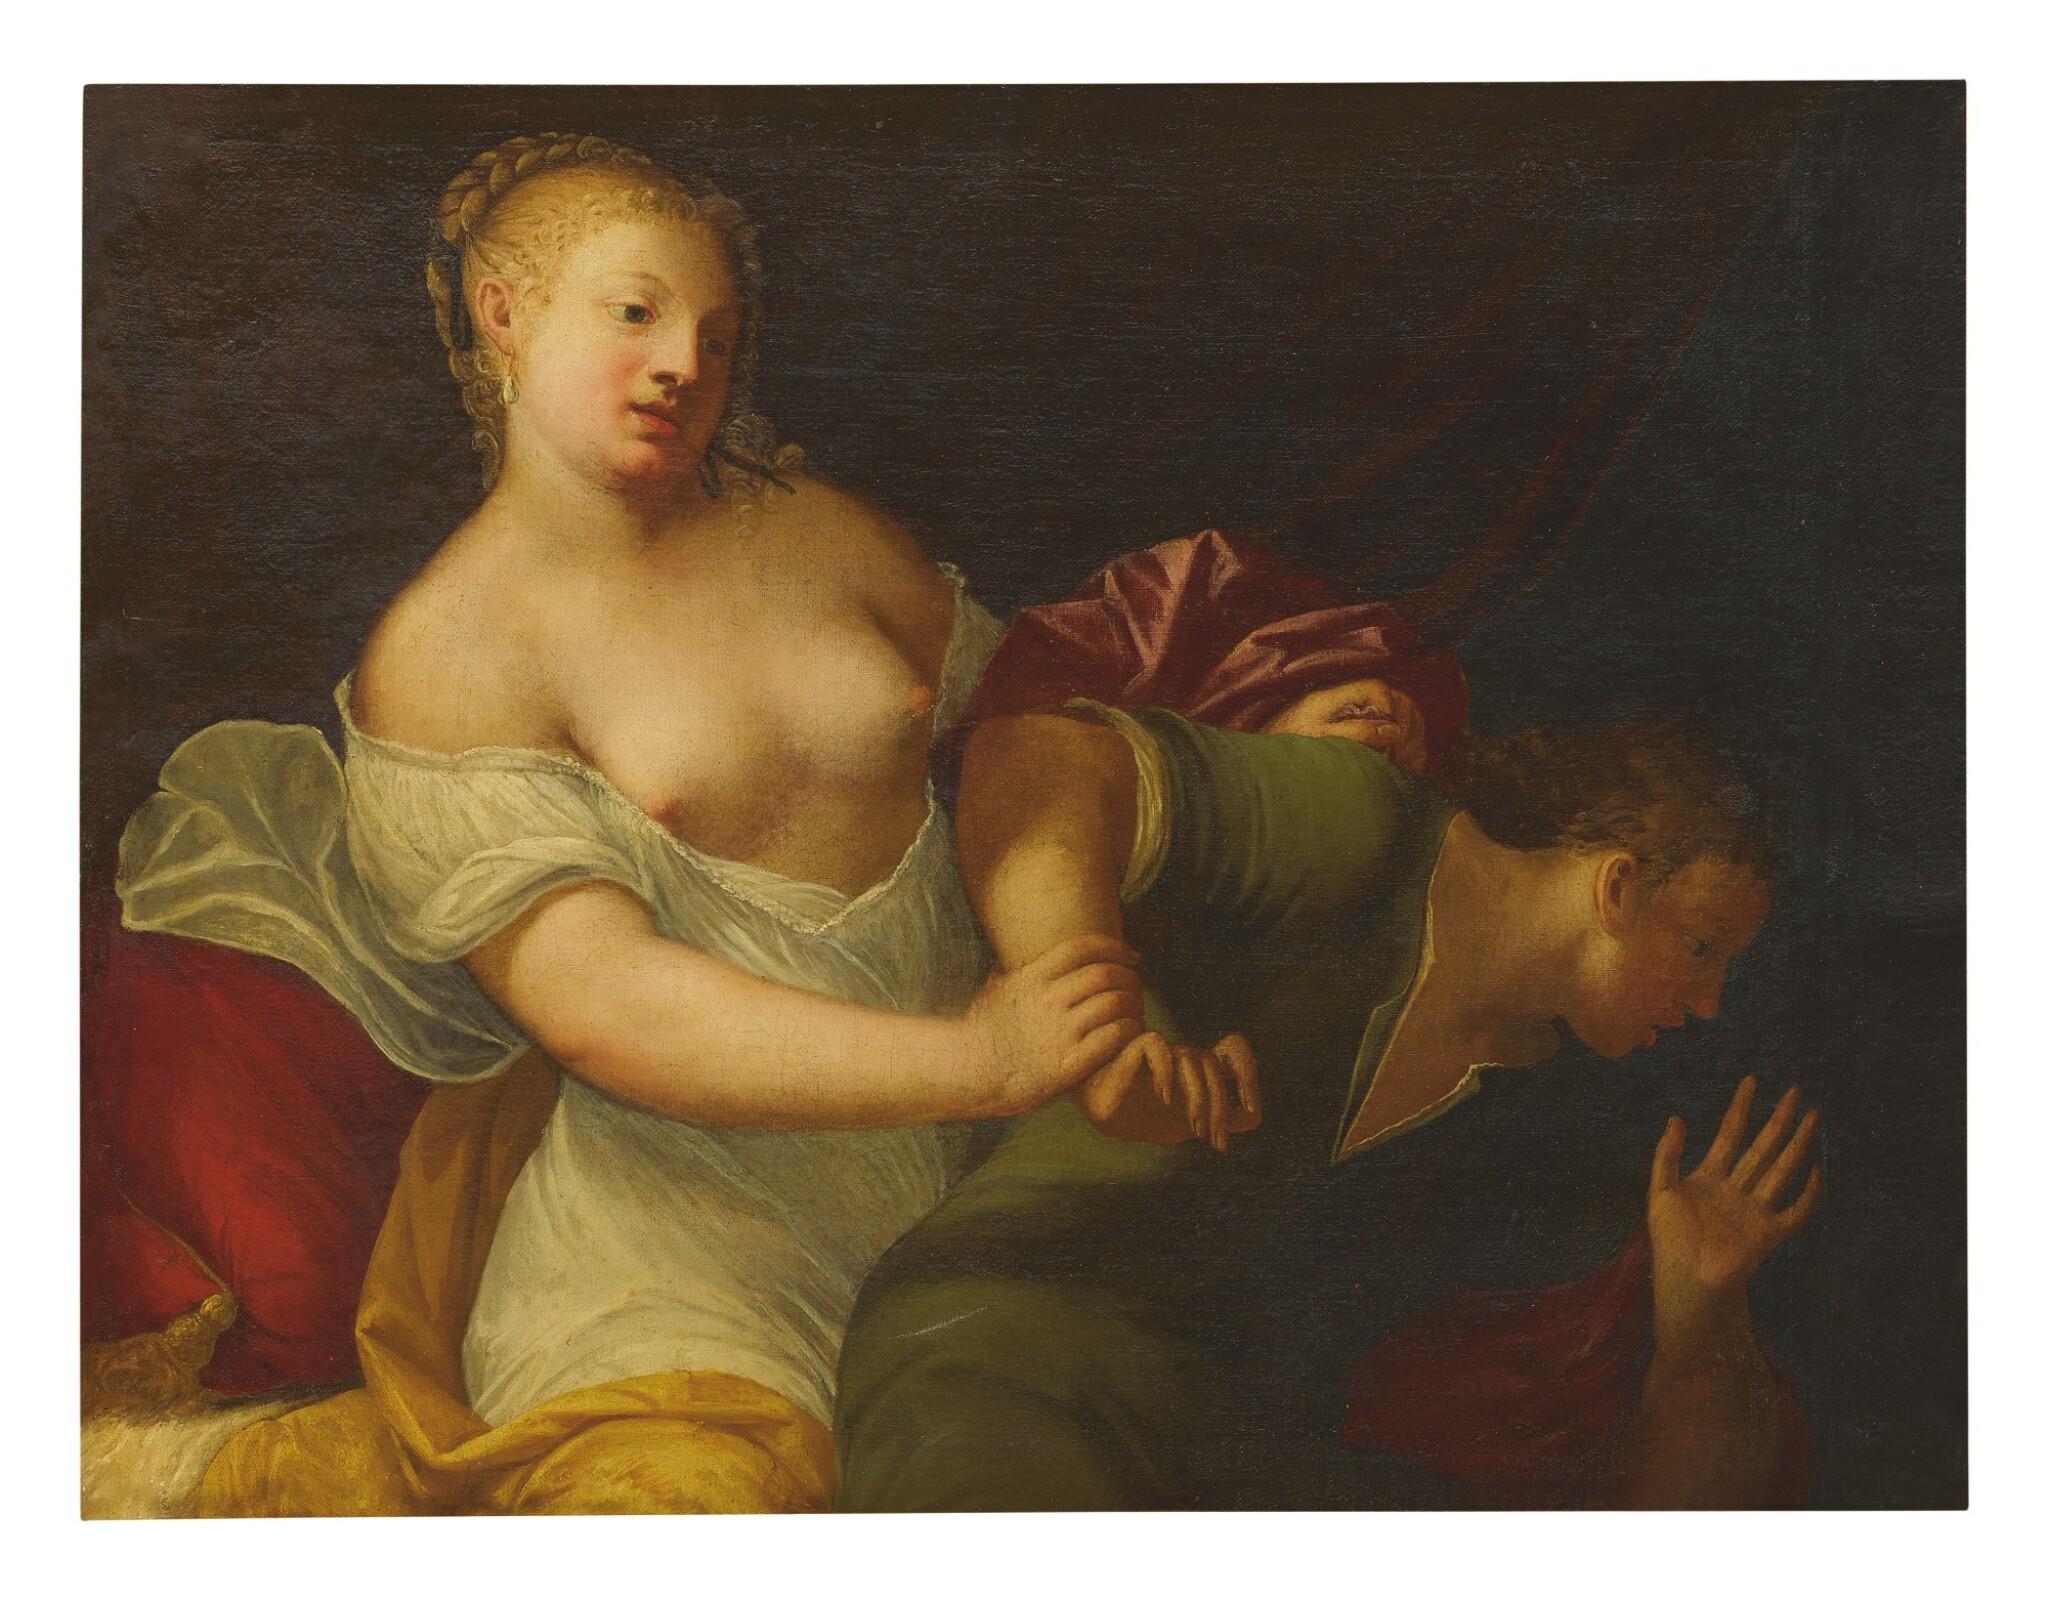 MARCO LIBERI | JOSEPH AND POTIPHAR'S WIFE